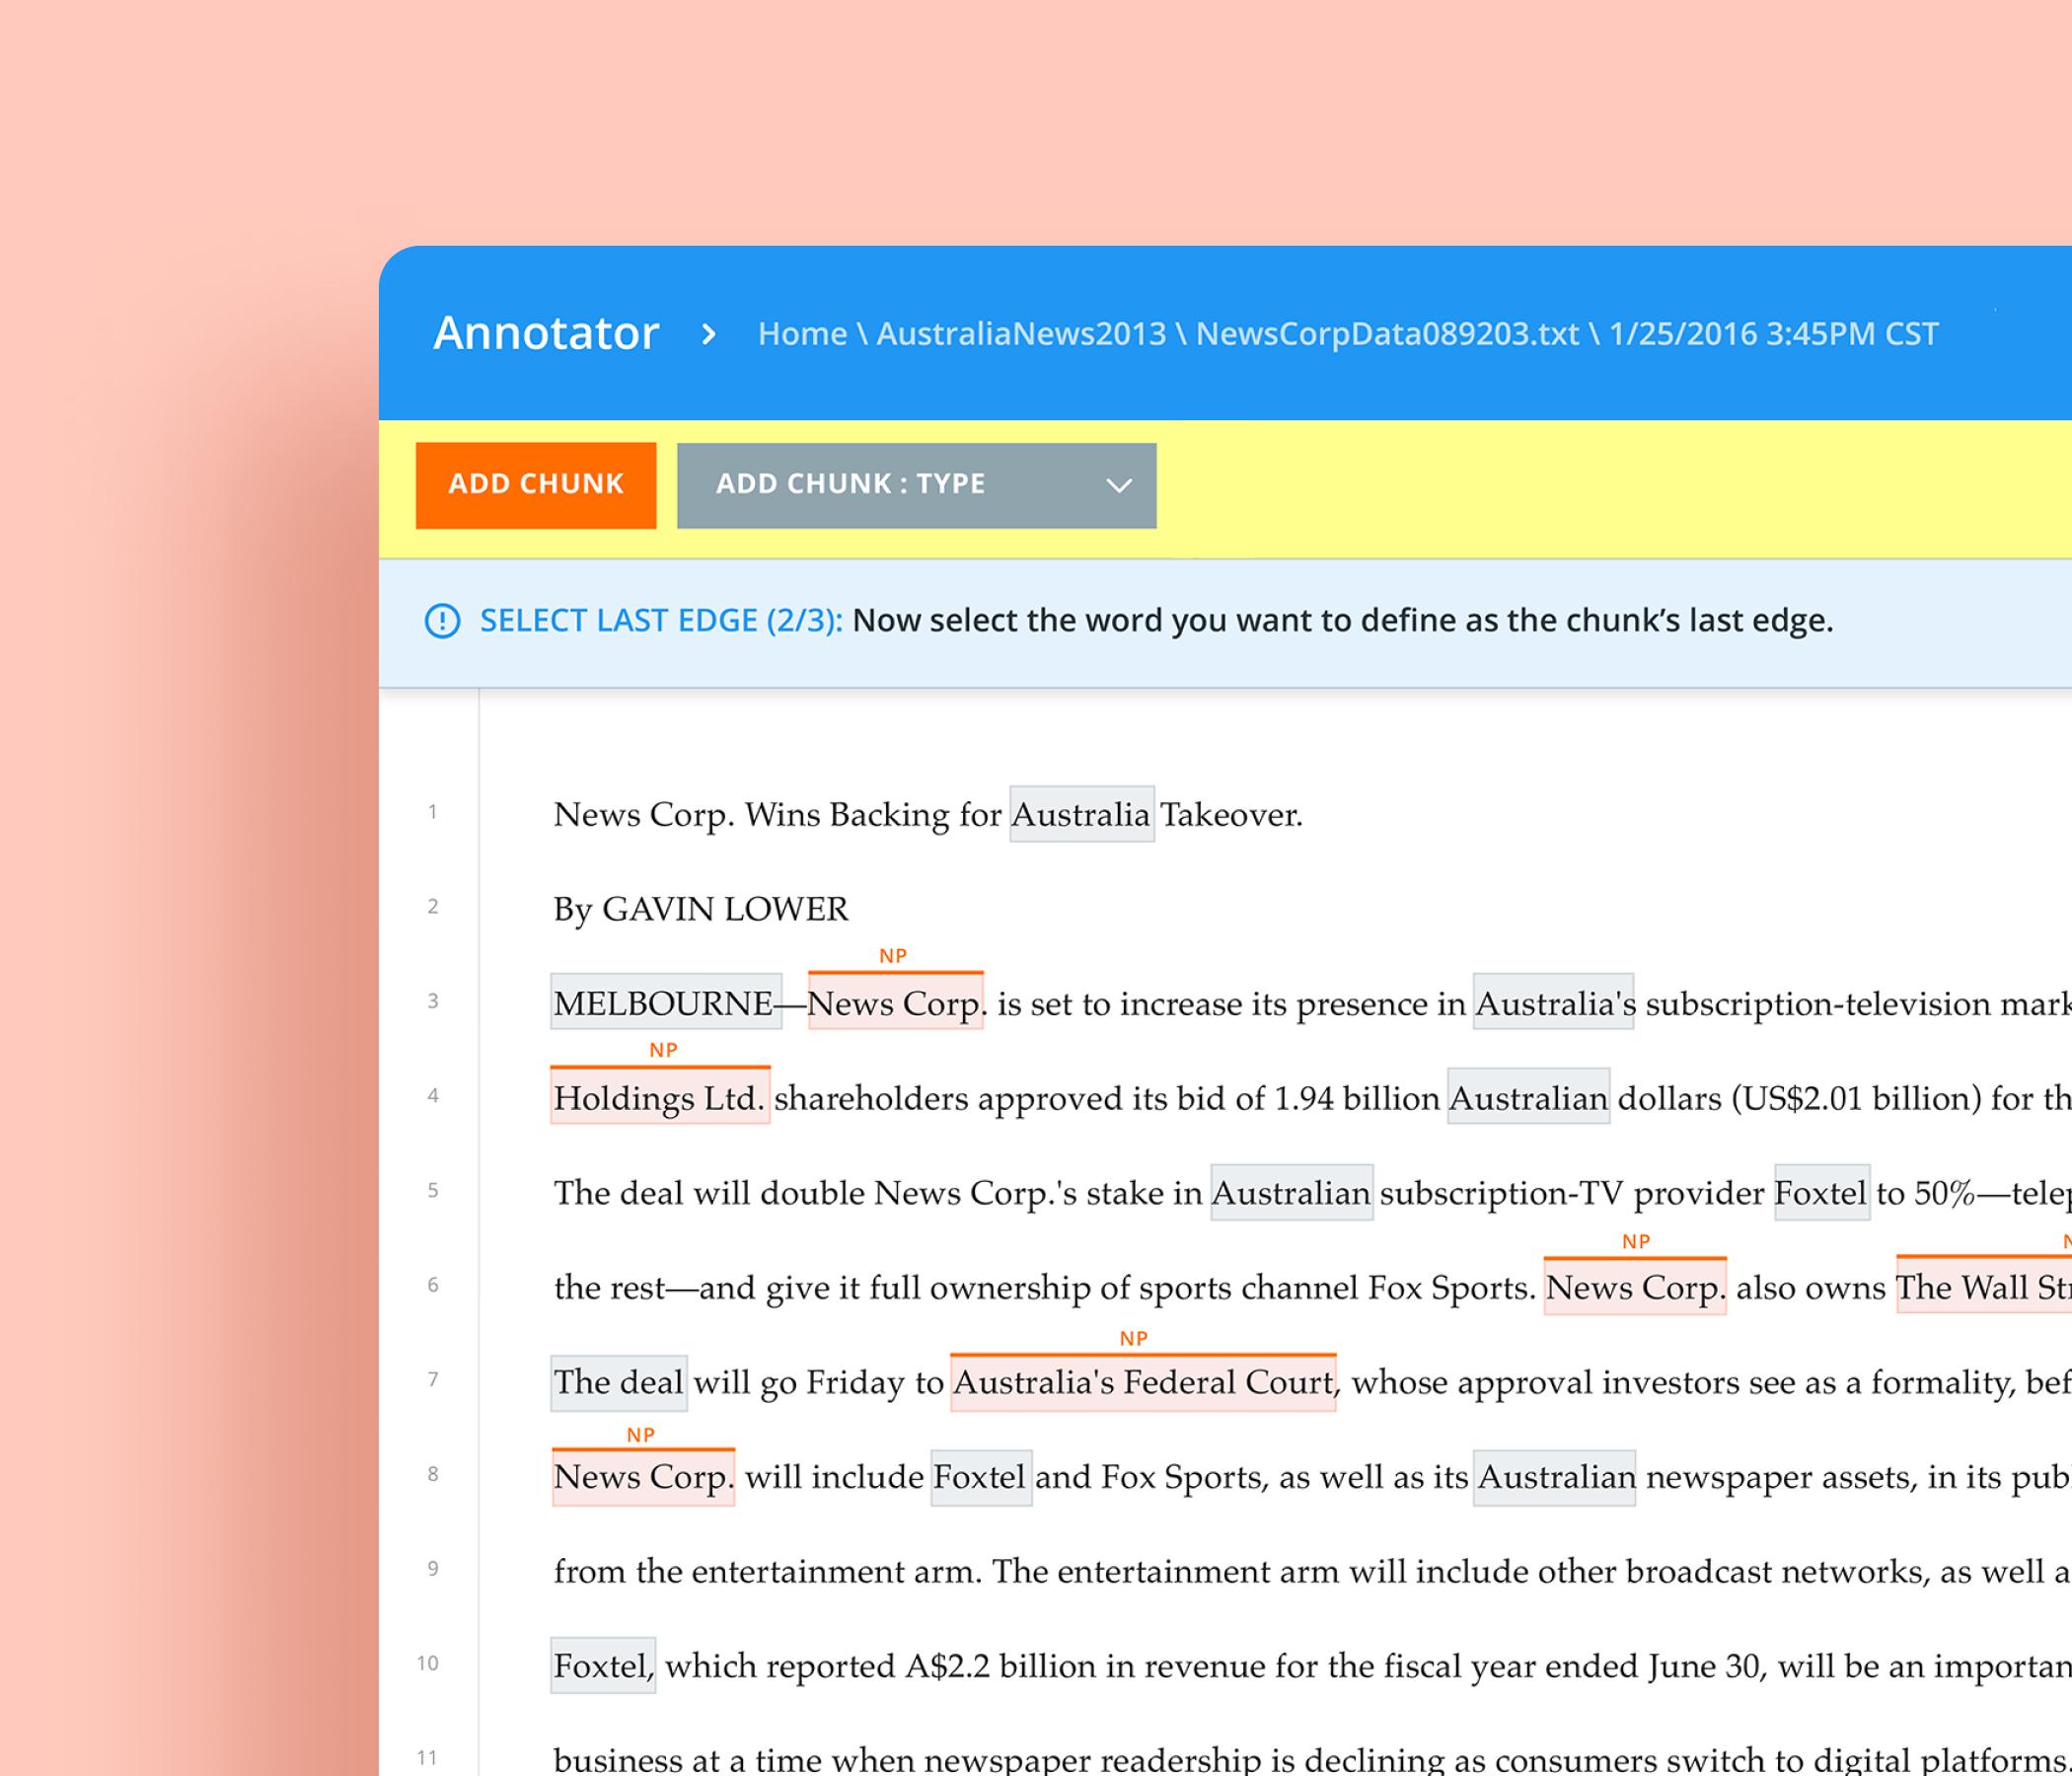 annotator-case-study